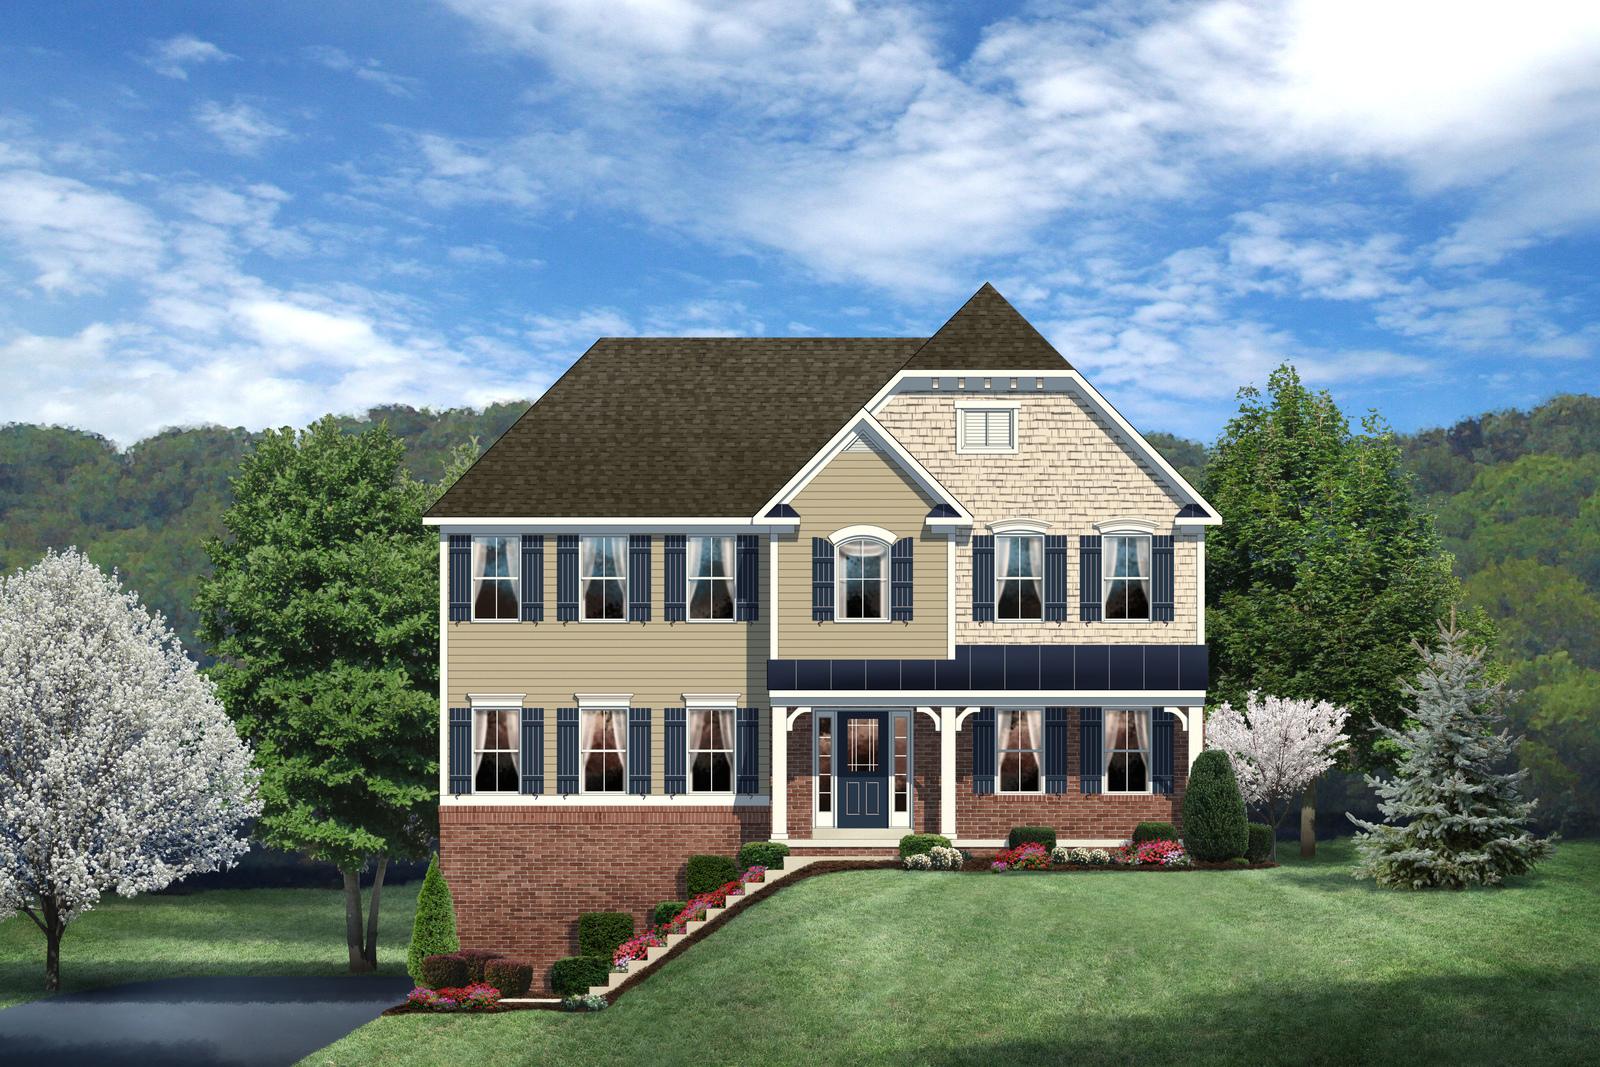 New oakmont home model for sale heartland homes for Heartland homes pittsburgh floor plans